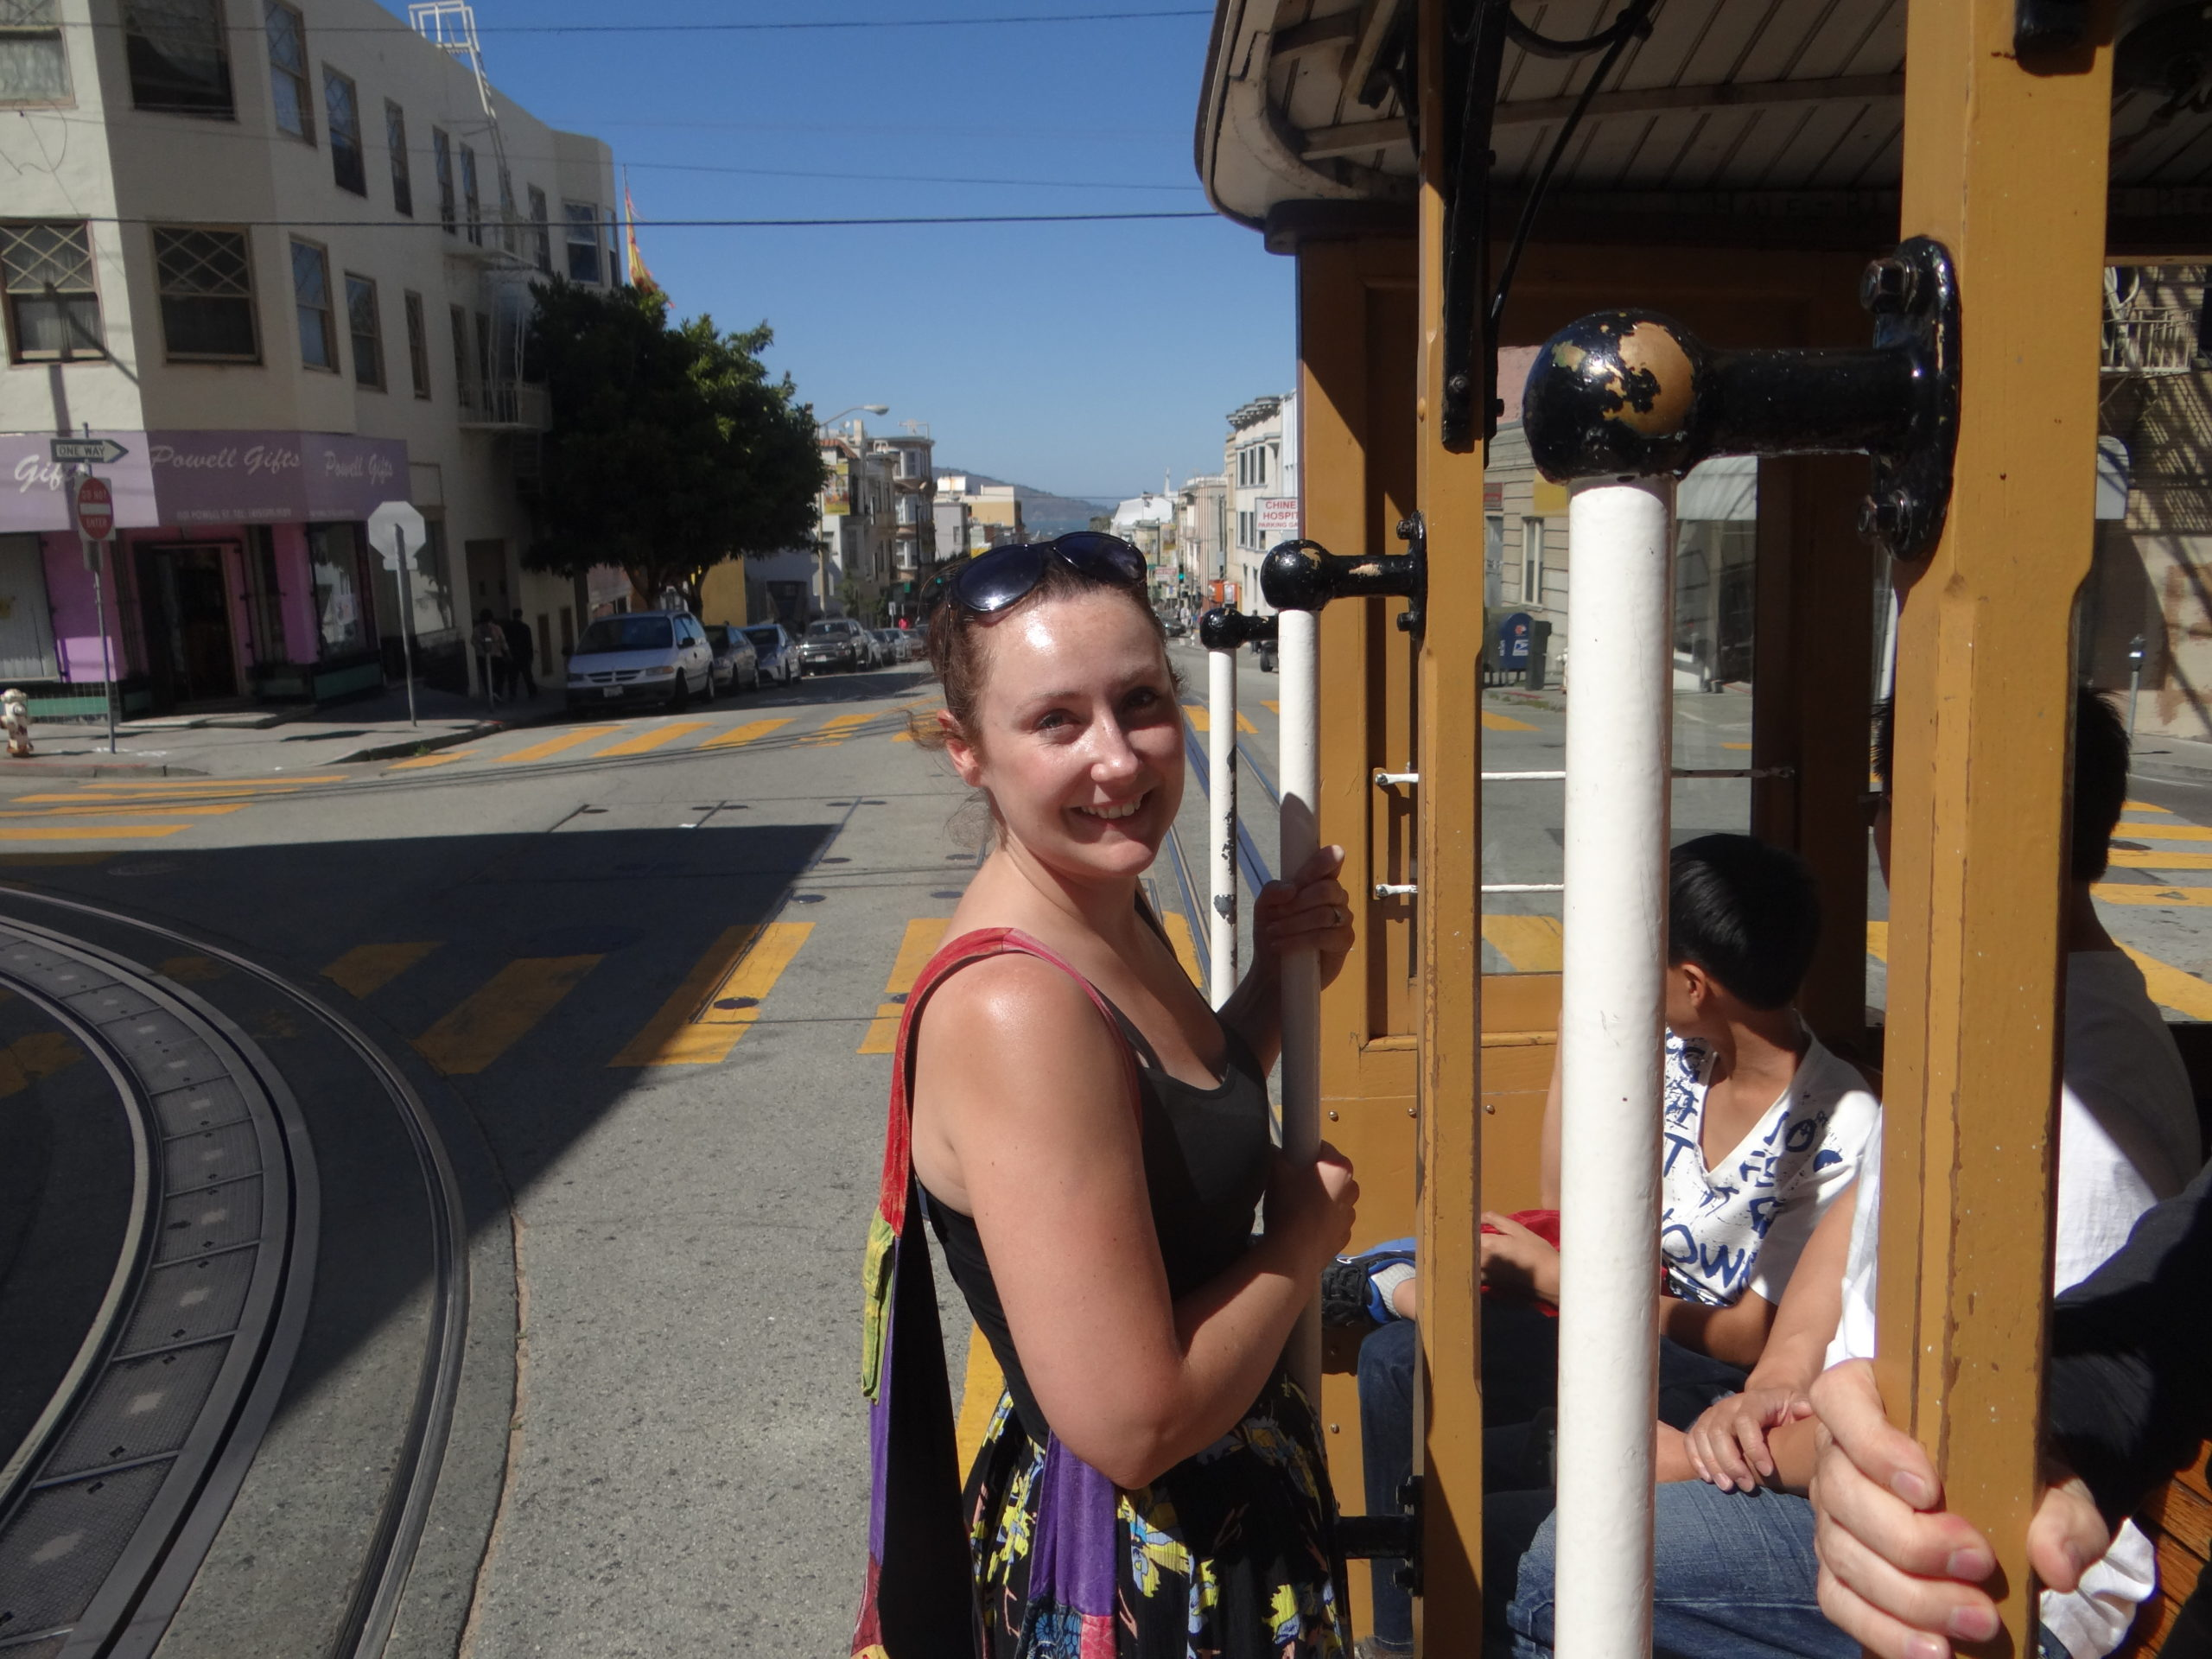 Riding the San Francisco Cable Car